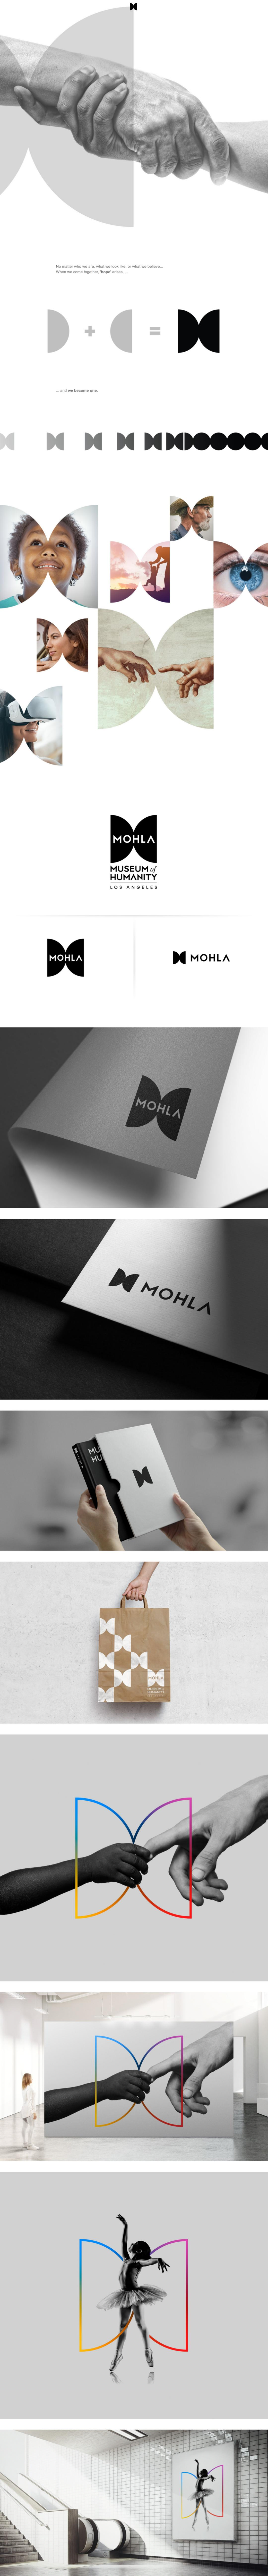 Branding,Graphic Design,Print Design